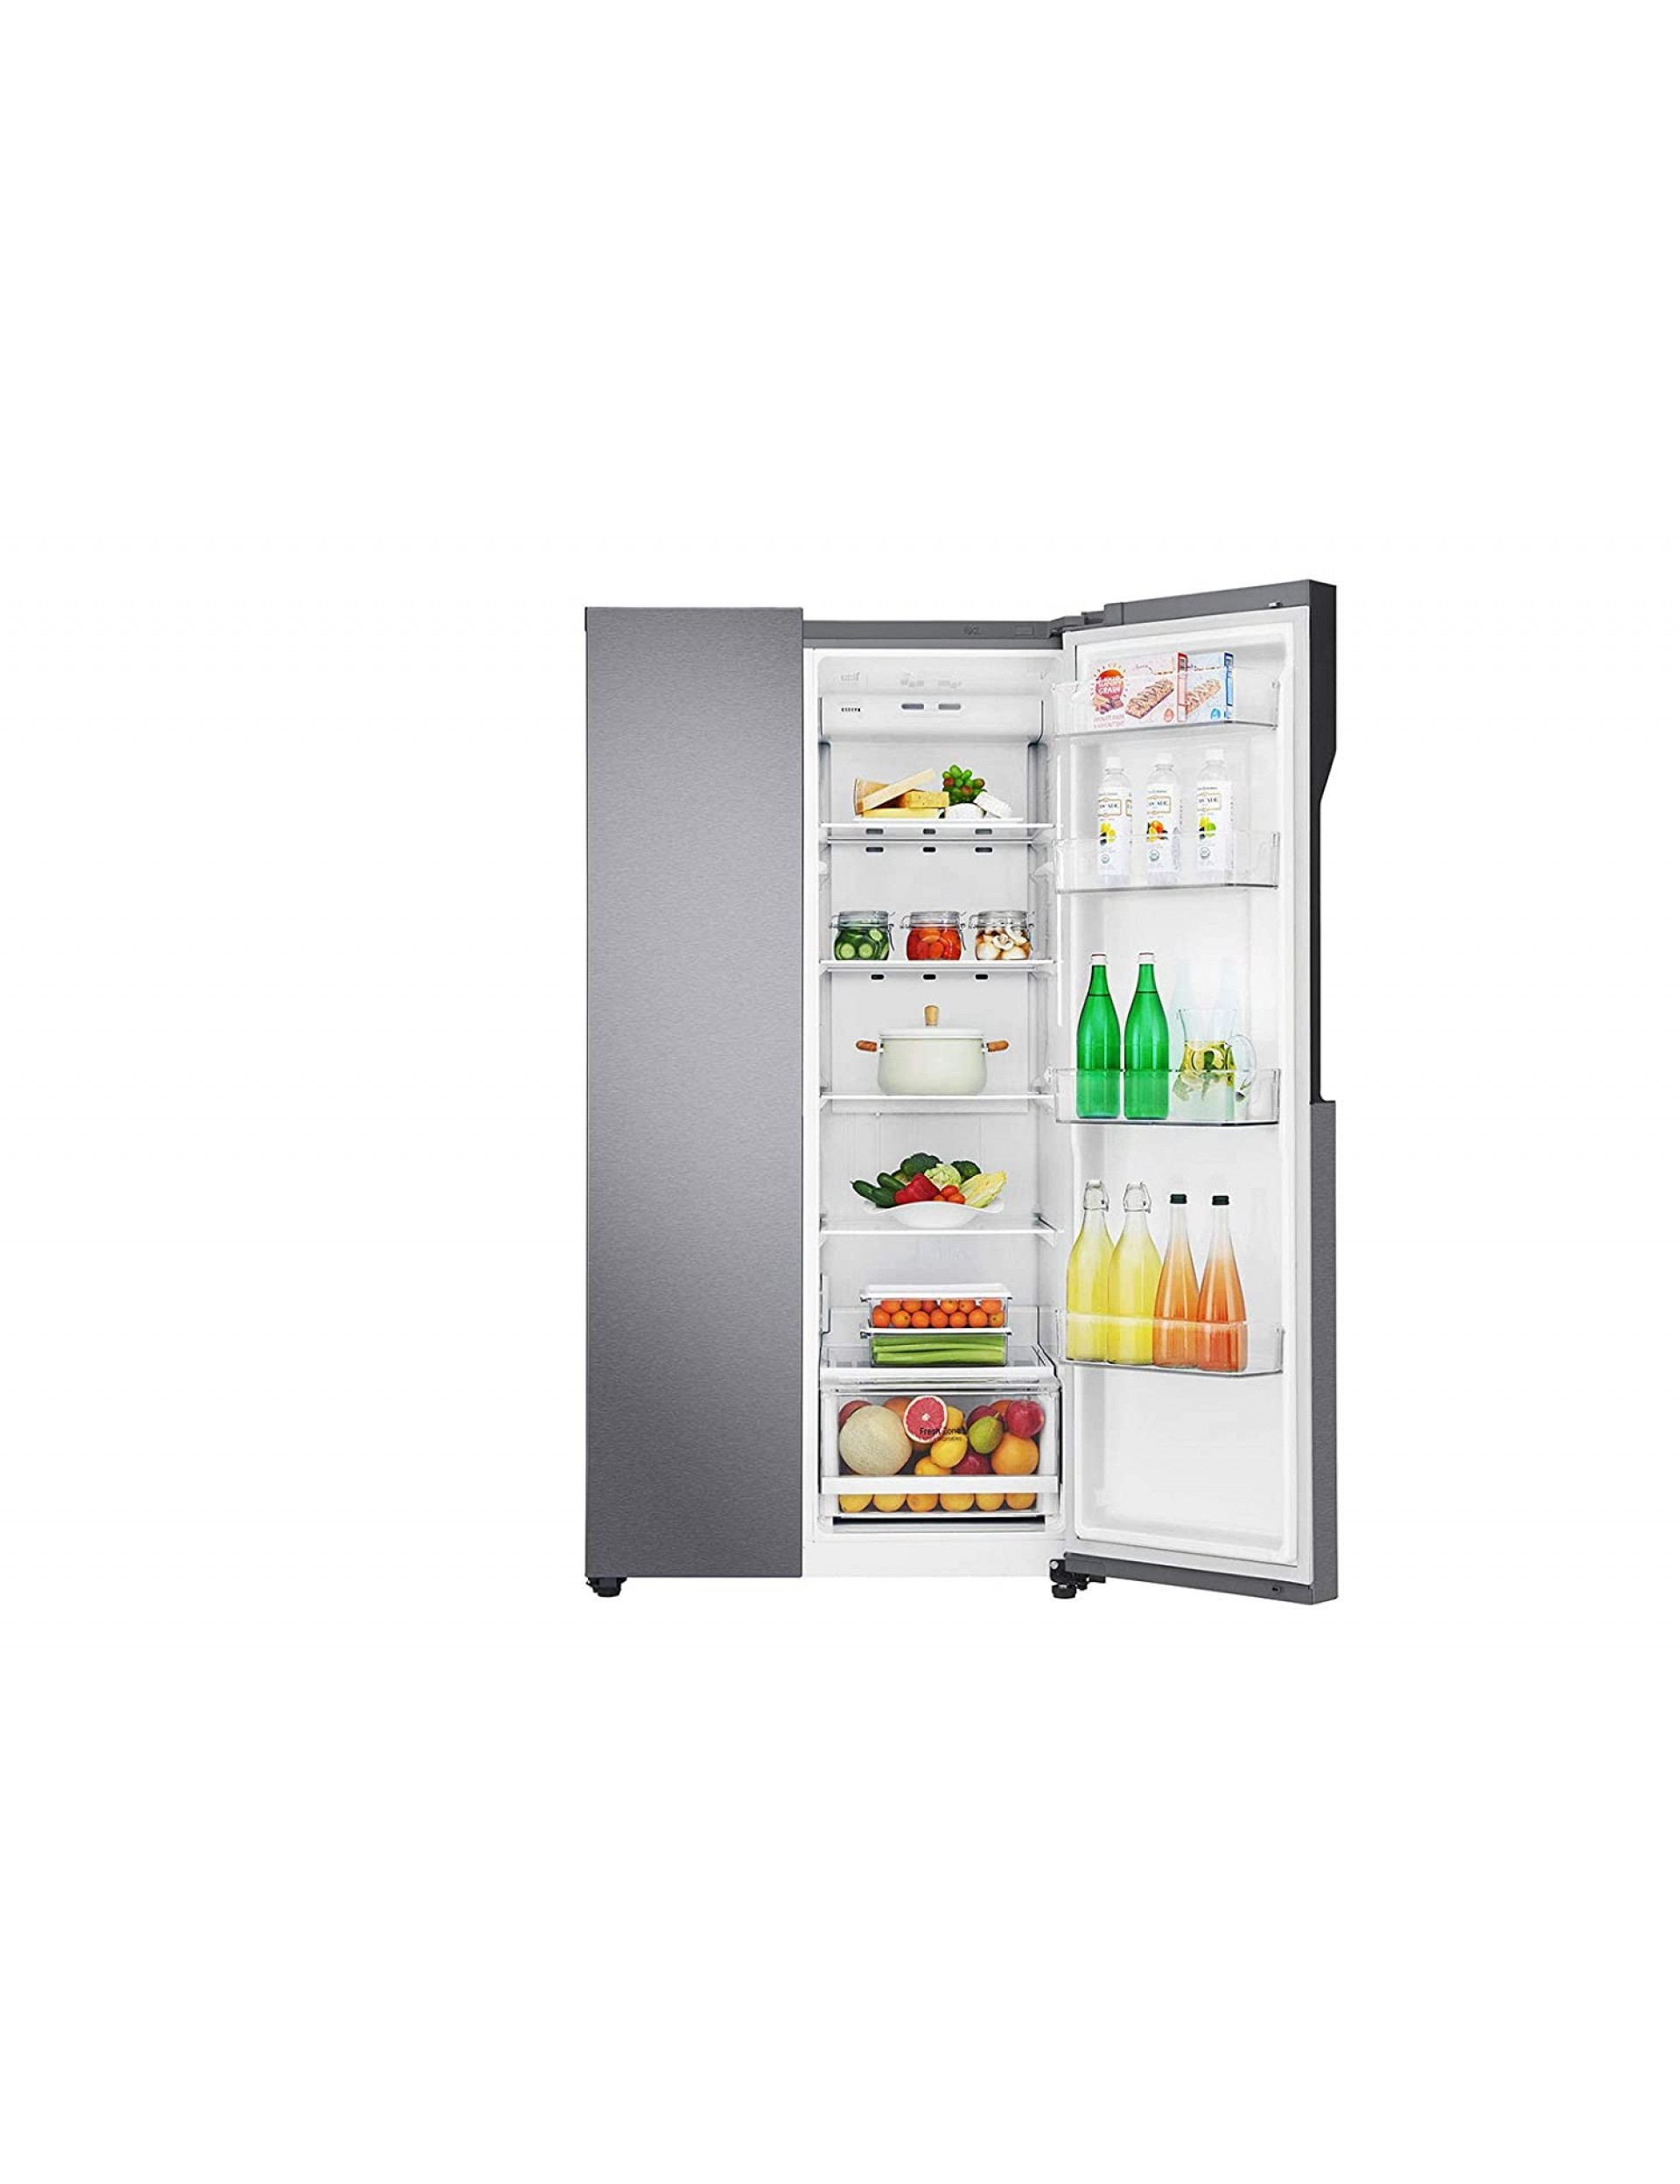 Lg 679 L Frost Free Side By Side Refrigerator Gc B247kqdv